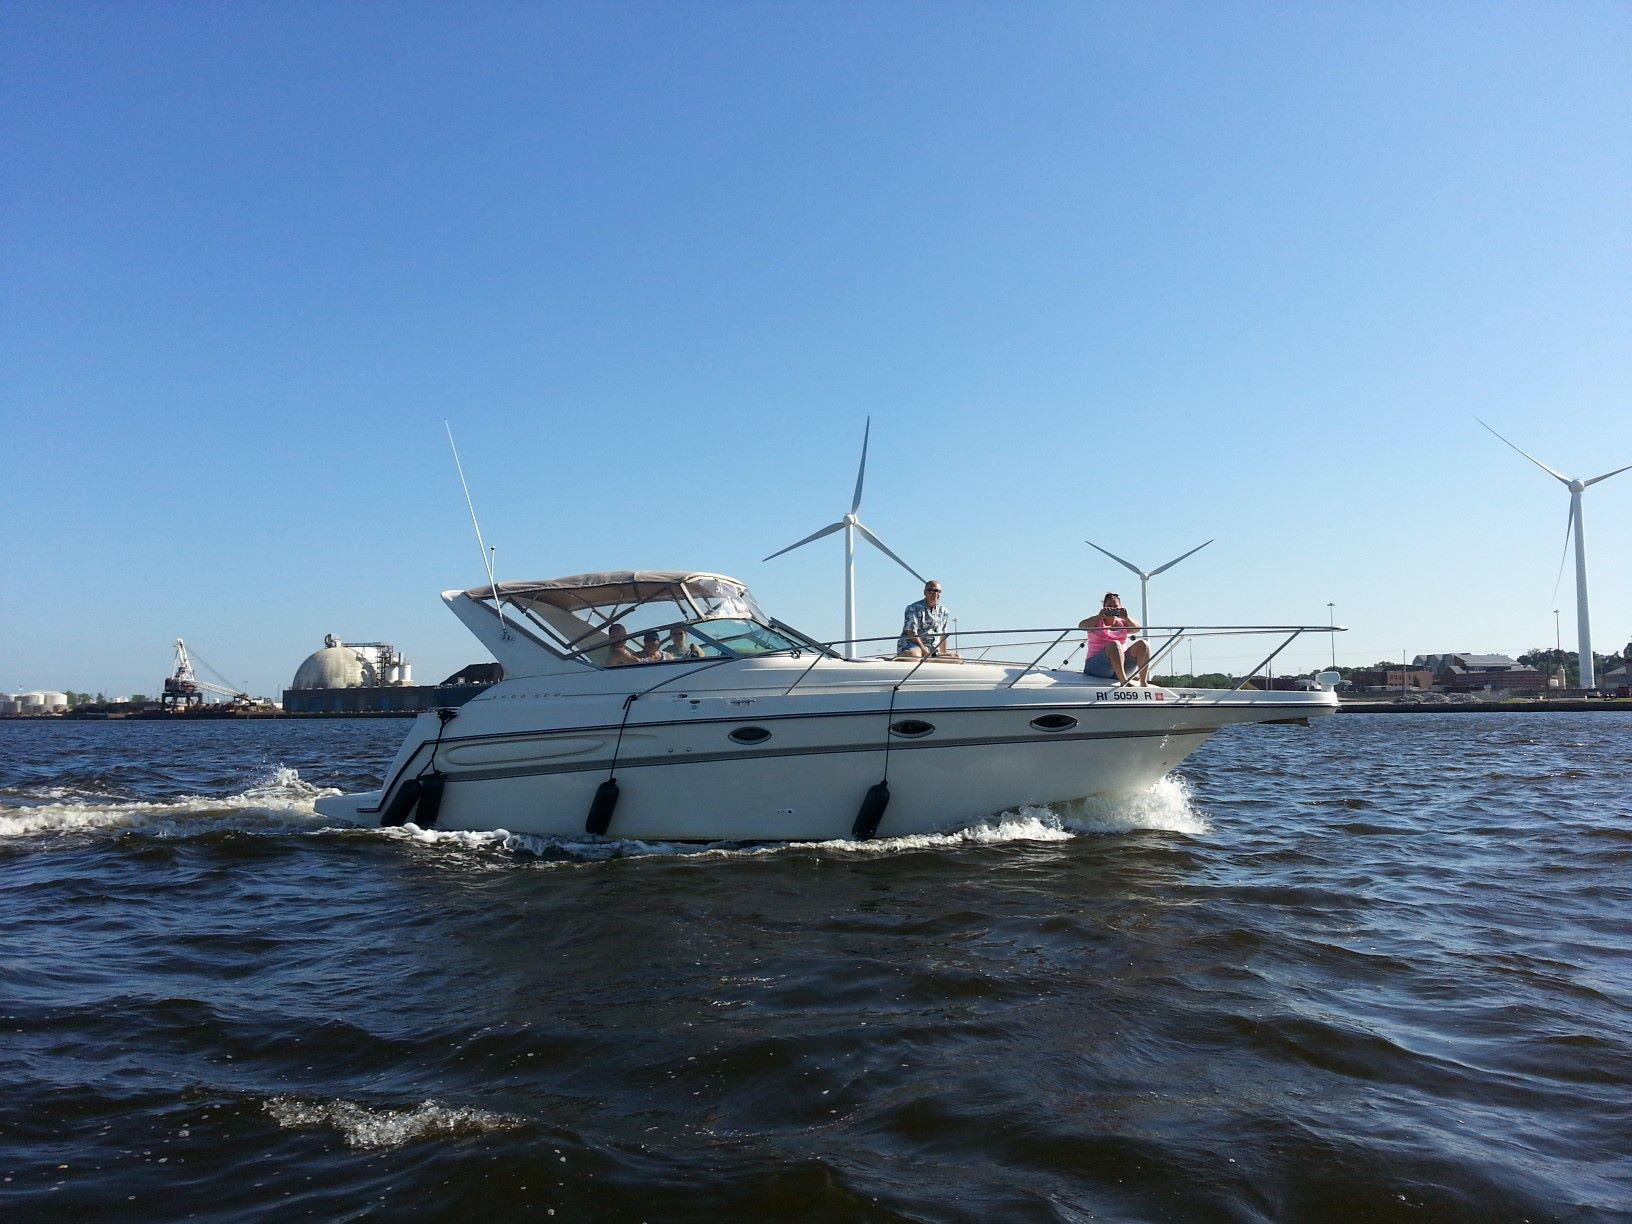 Maxum Boat, Boat, Sailing, Sea, Speed, HQ Photo